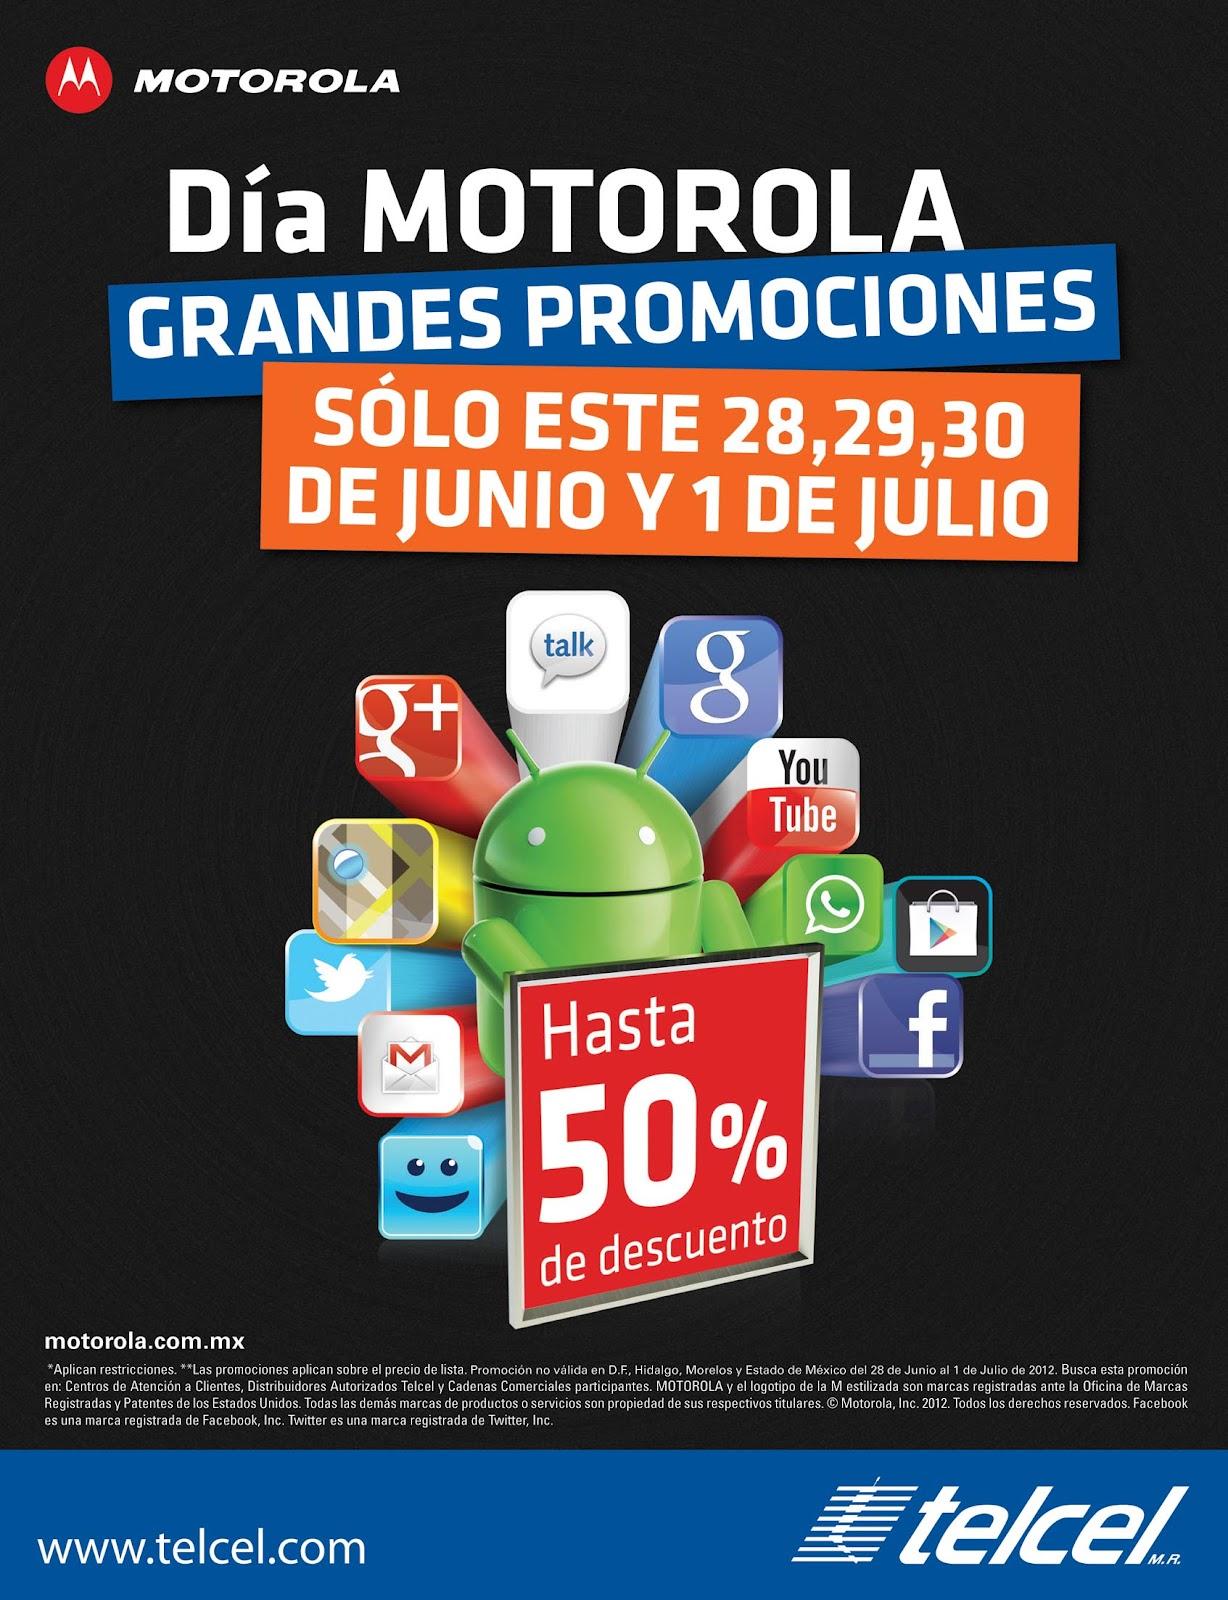 regalo iphone 3gs